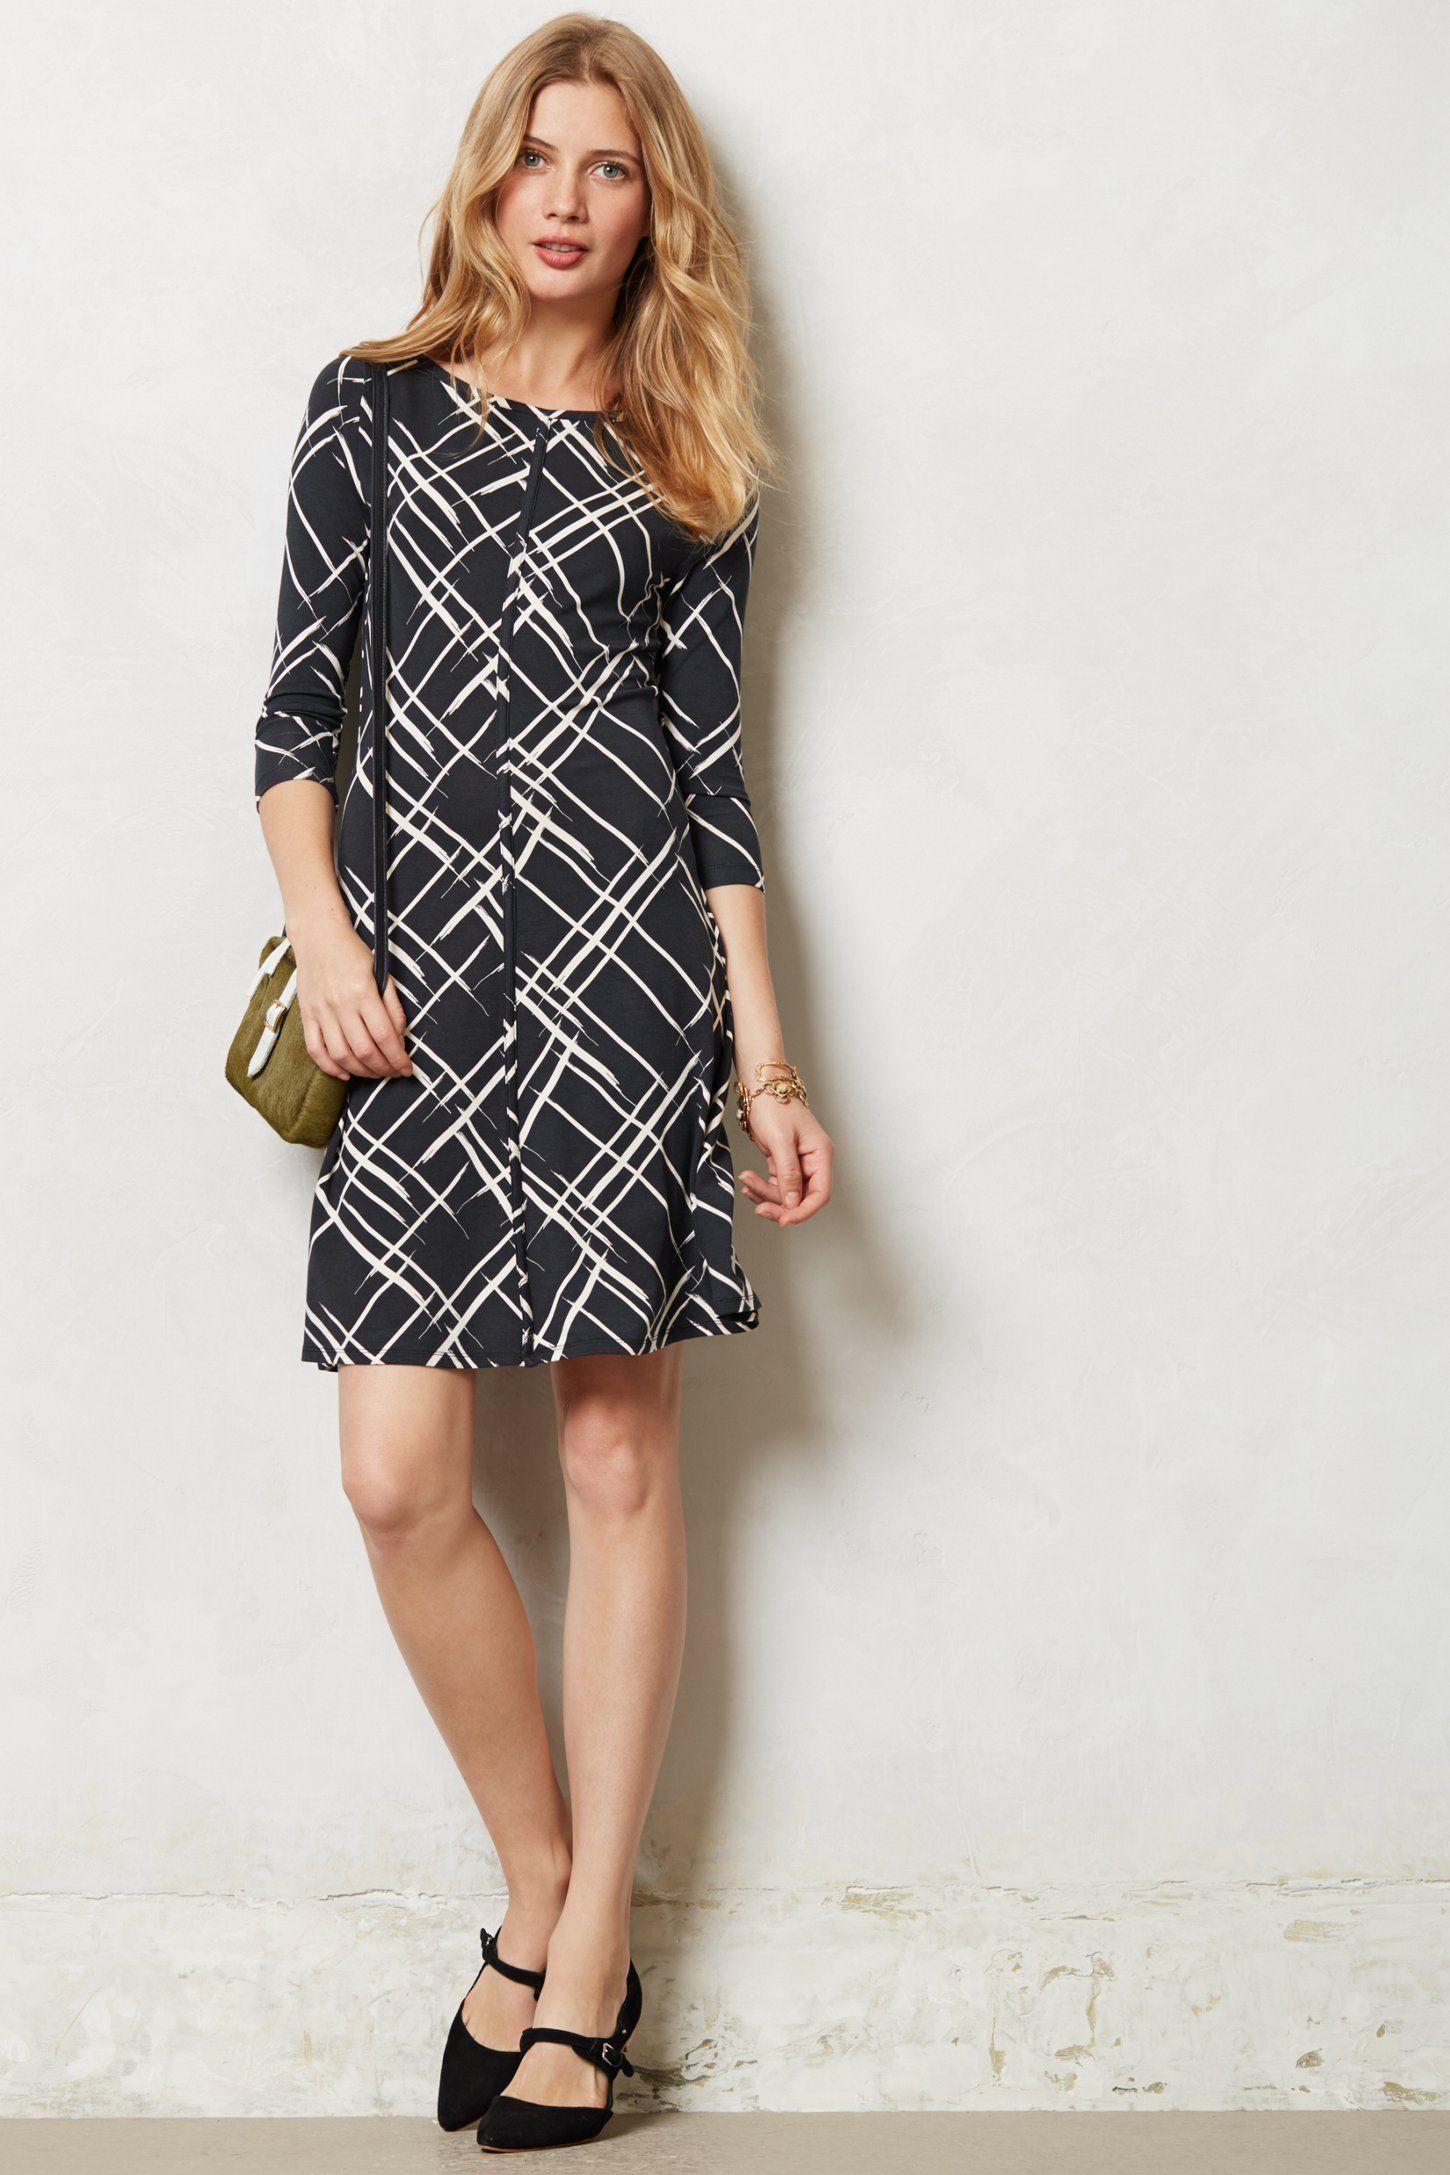 Etched Plaid Dress - anthropologie.com